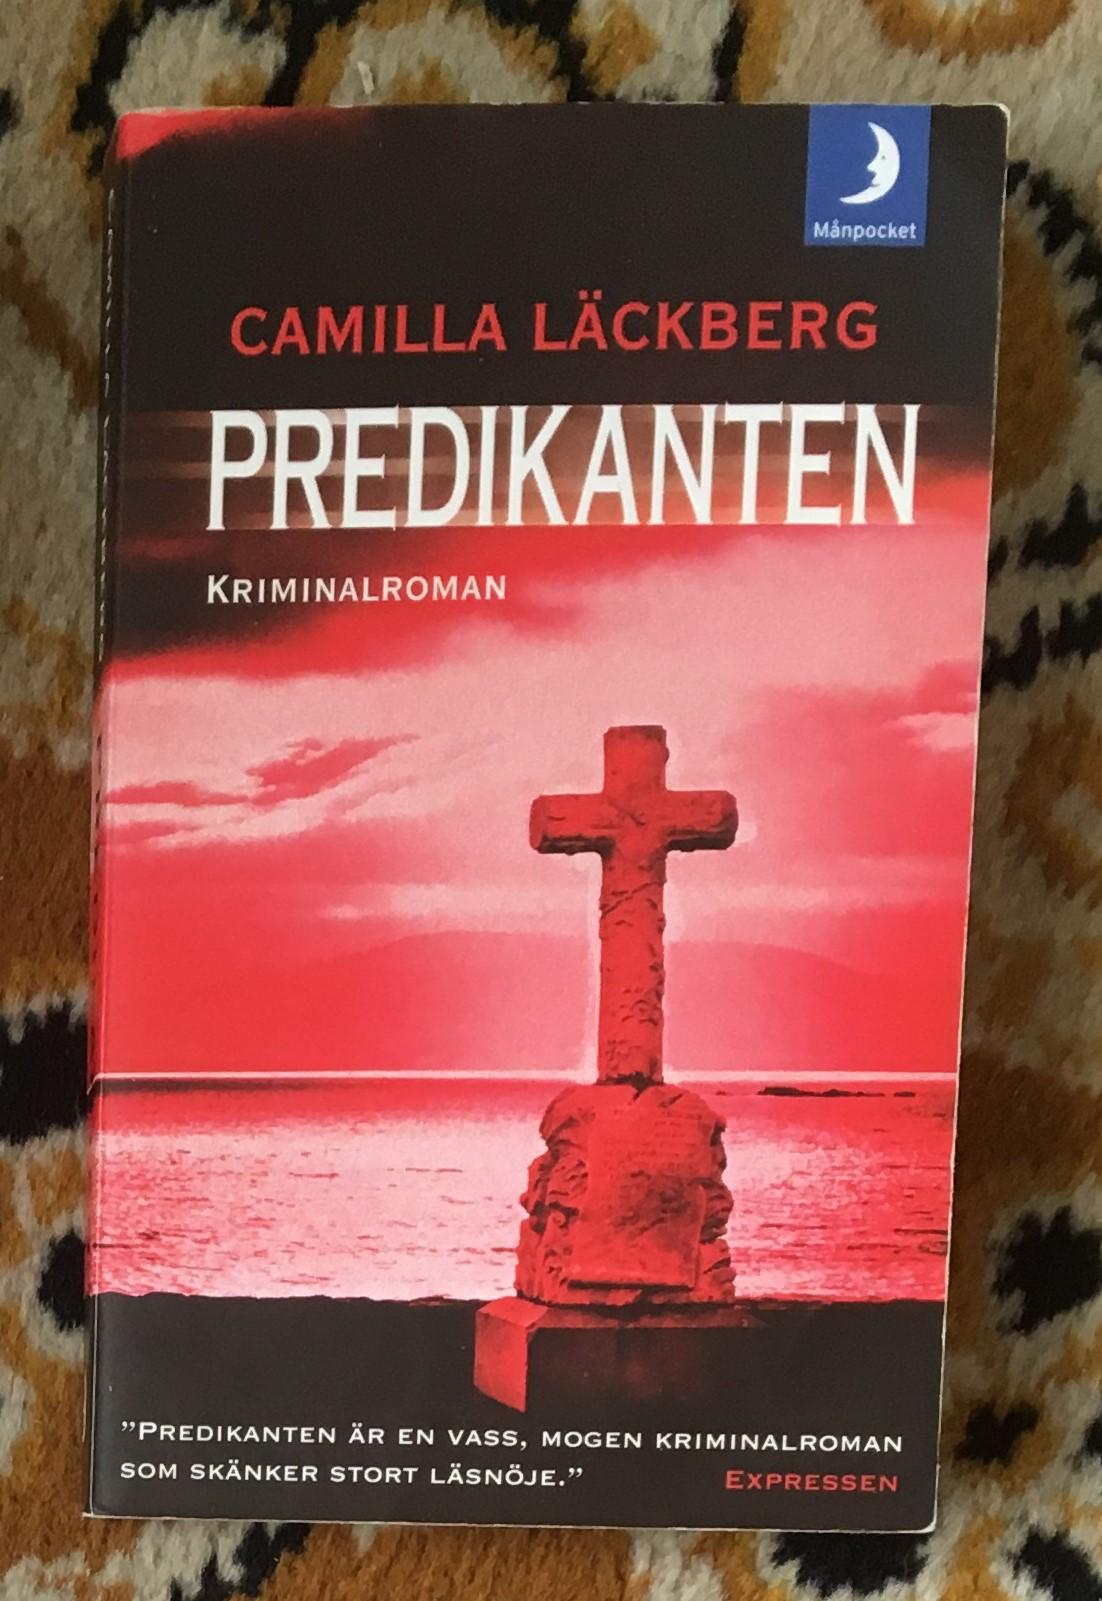 Camilla Lackberg, Predikanten, SZWEDZKI